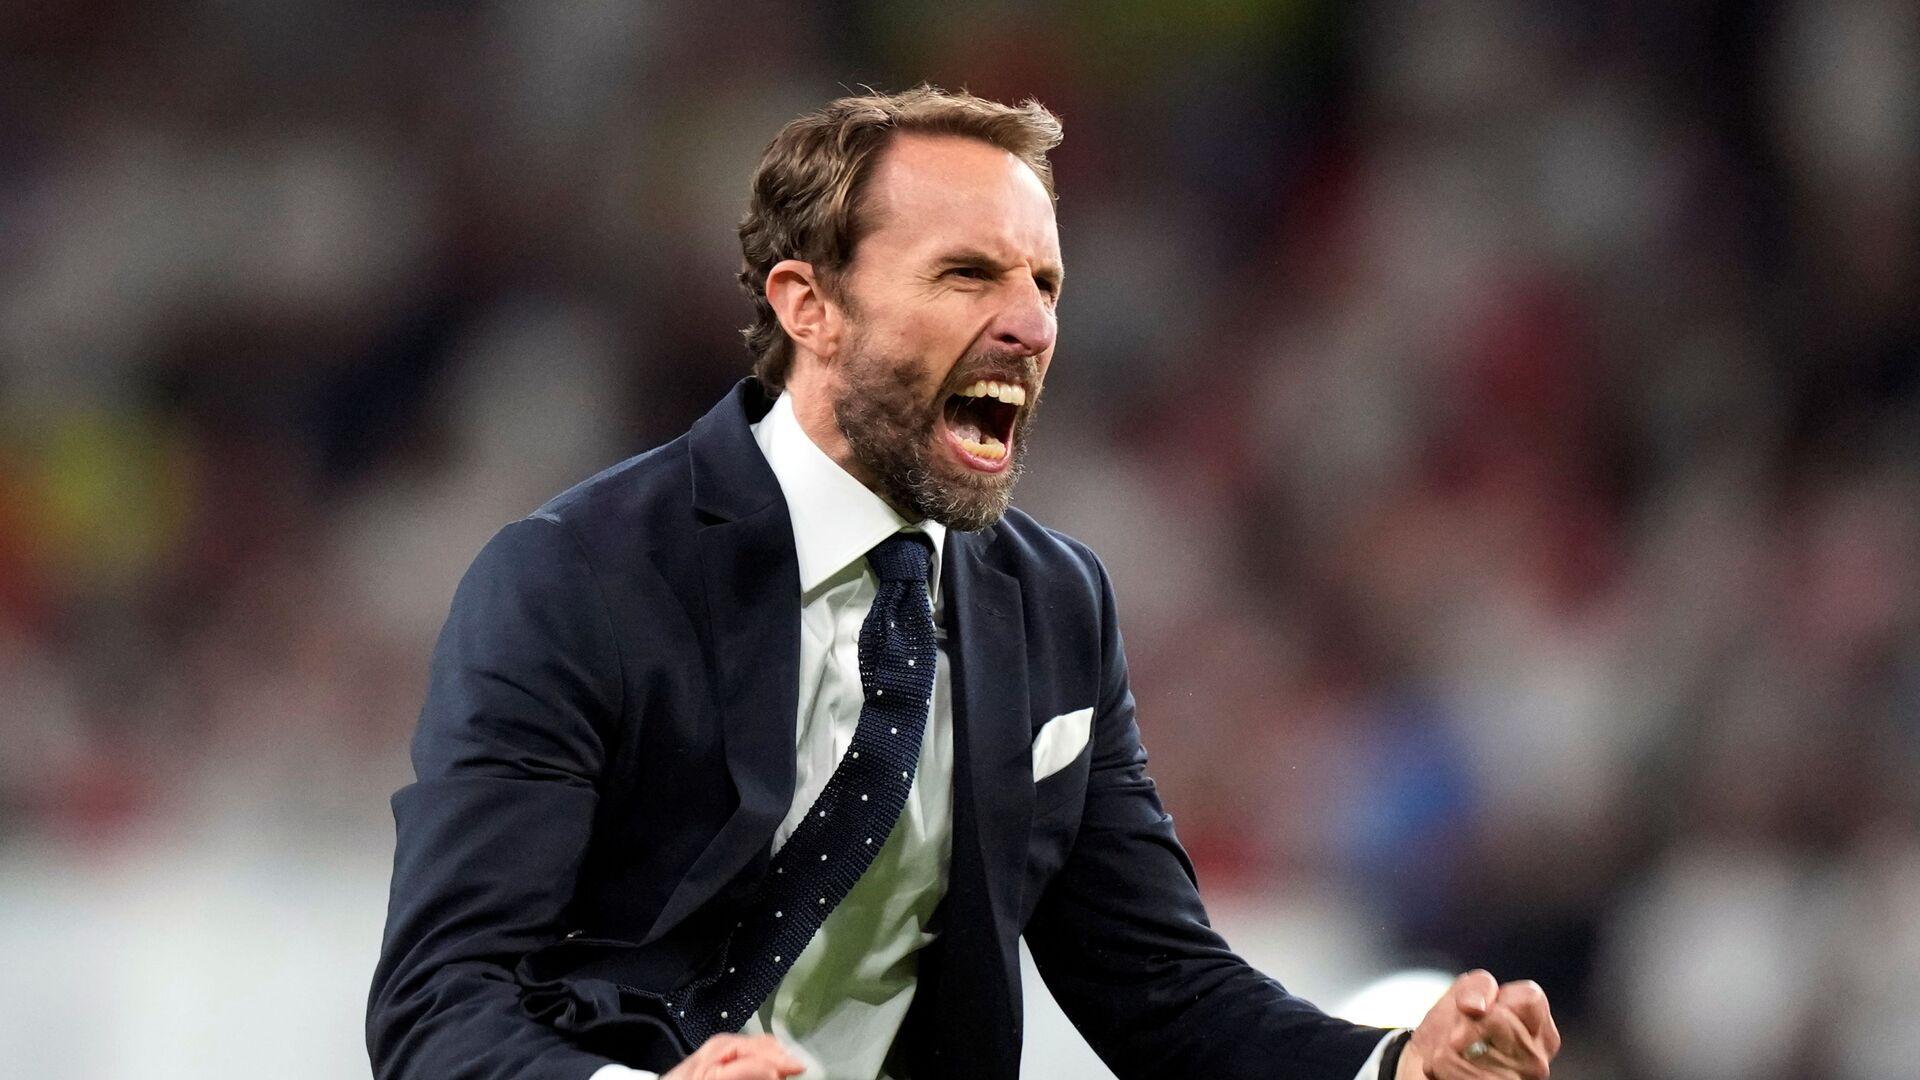 Тренер сборной Англии Гарет Саутгейт во время матча Англия-Дания на Евро-2020 - Sputnik Italia, 1920, 10.07.2021